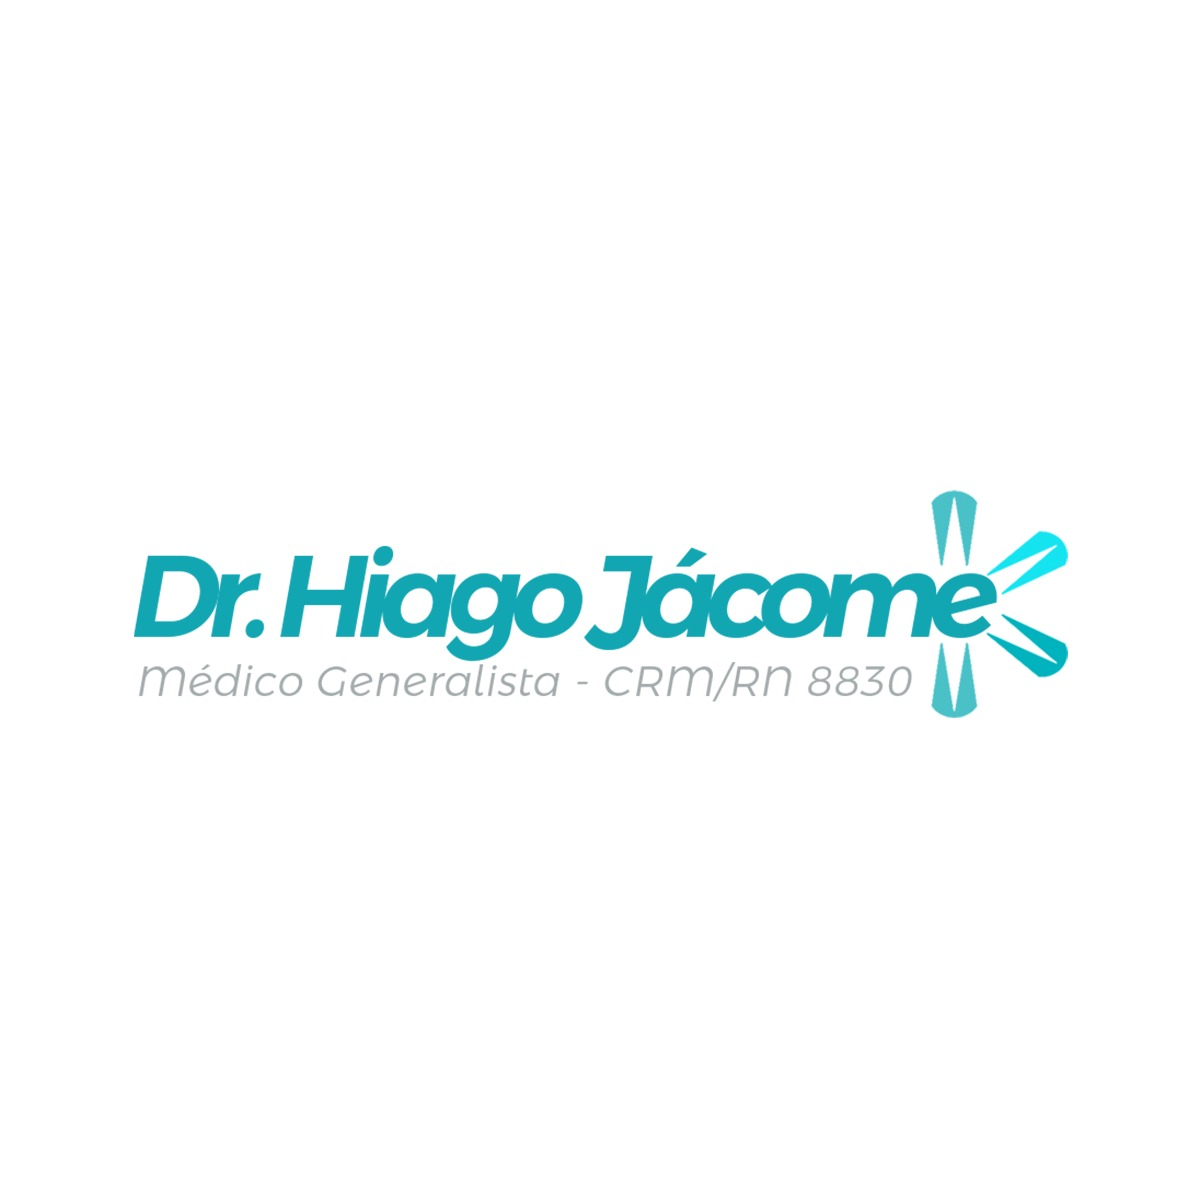 Dr. Hiago Jácome